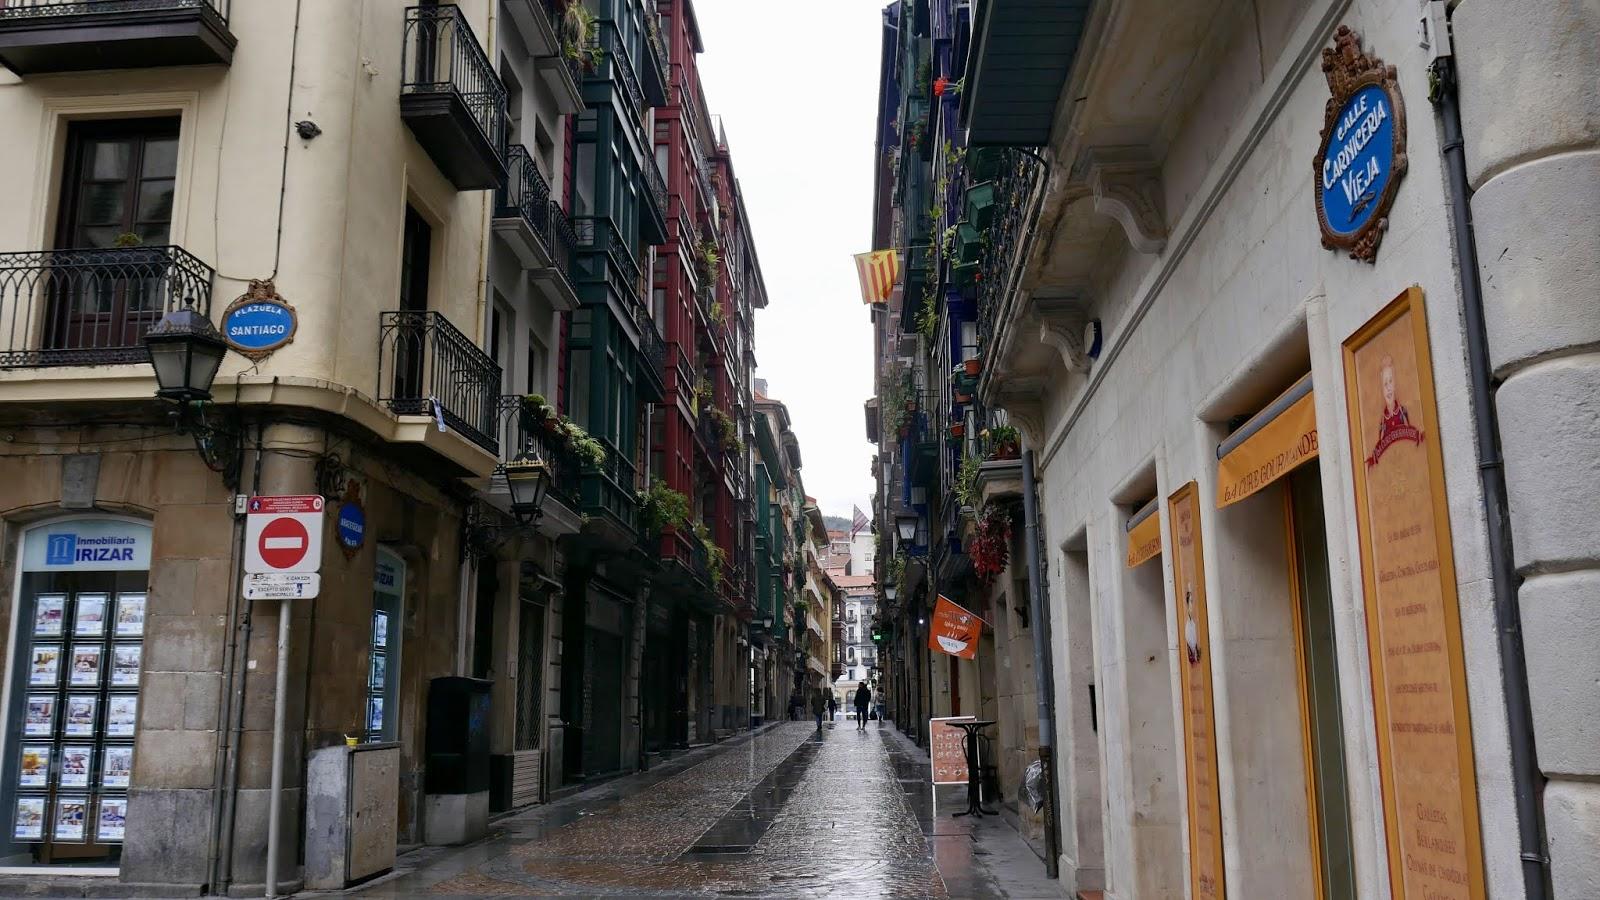 Calle Carniceria Vieja et Plaza Santiago Bilbao Pays Basque Espagne